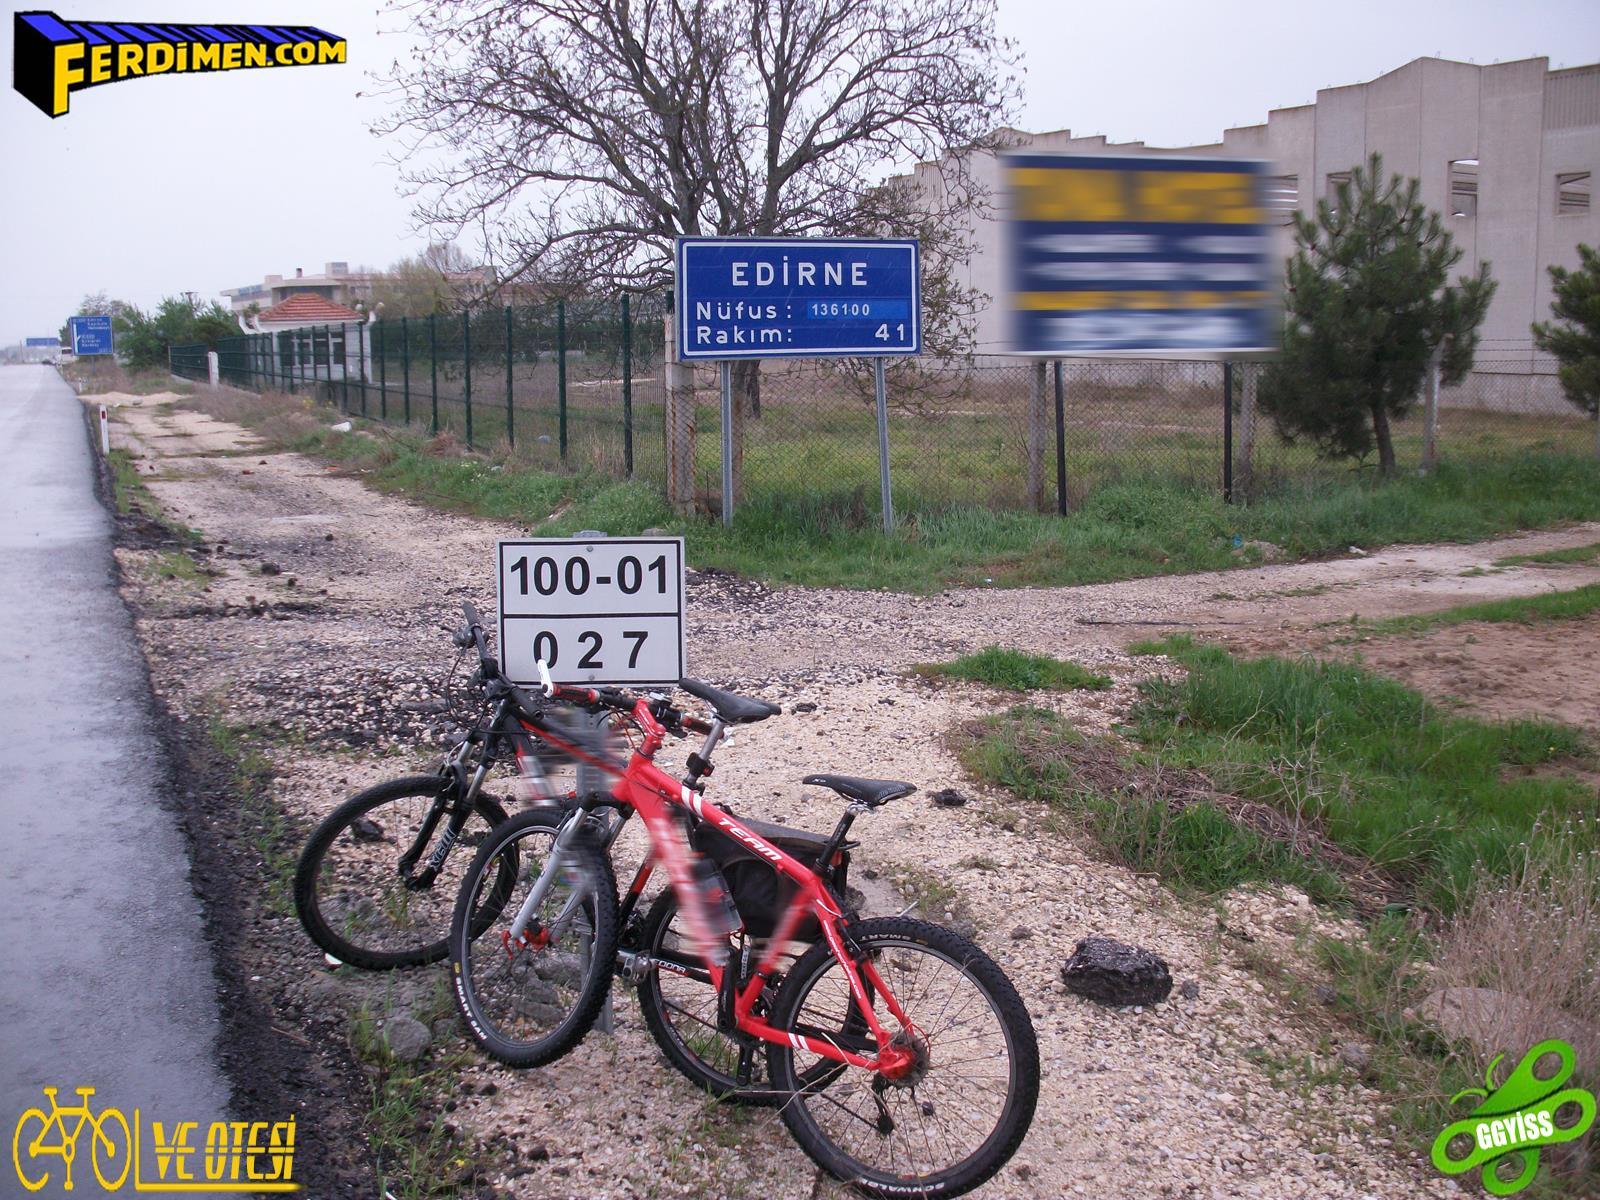 2012/04/18-19-20 Edirne Turu